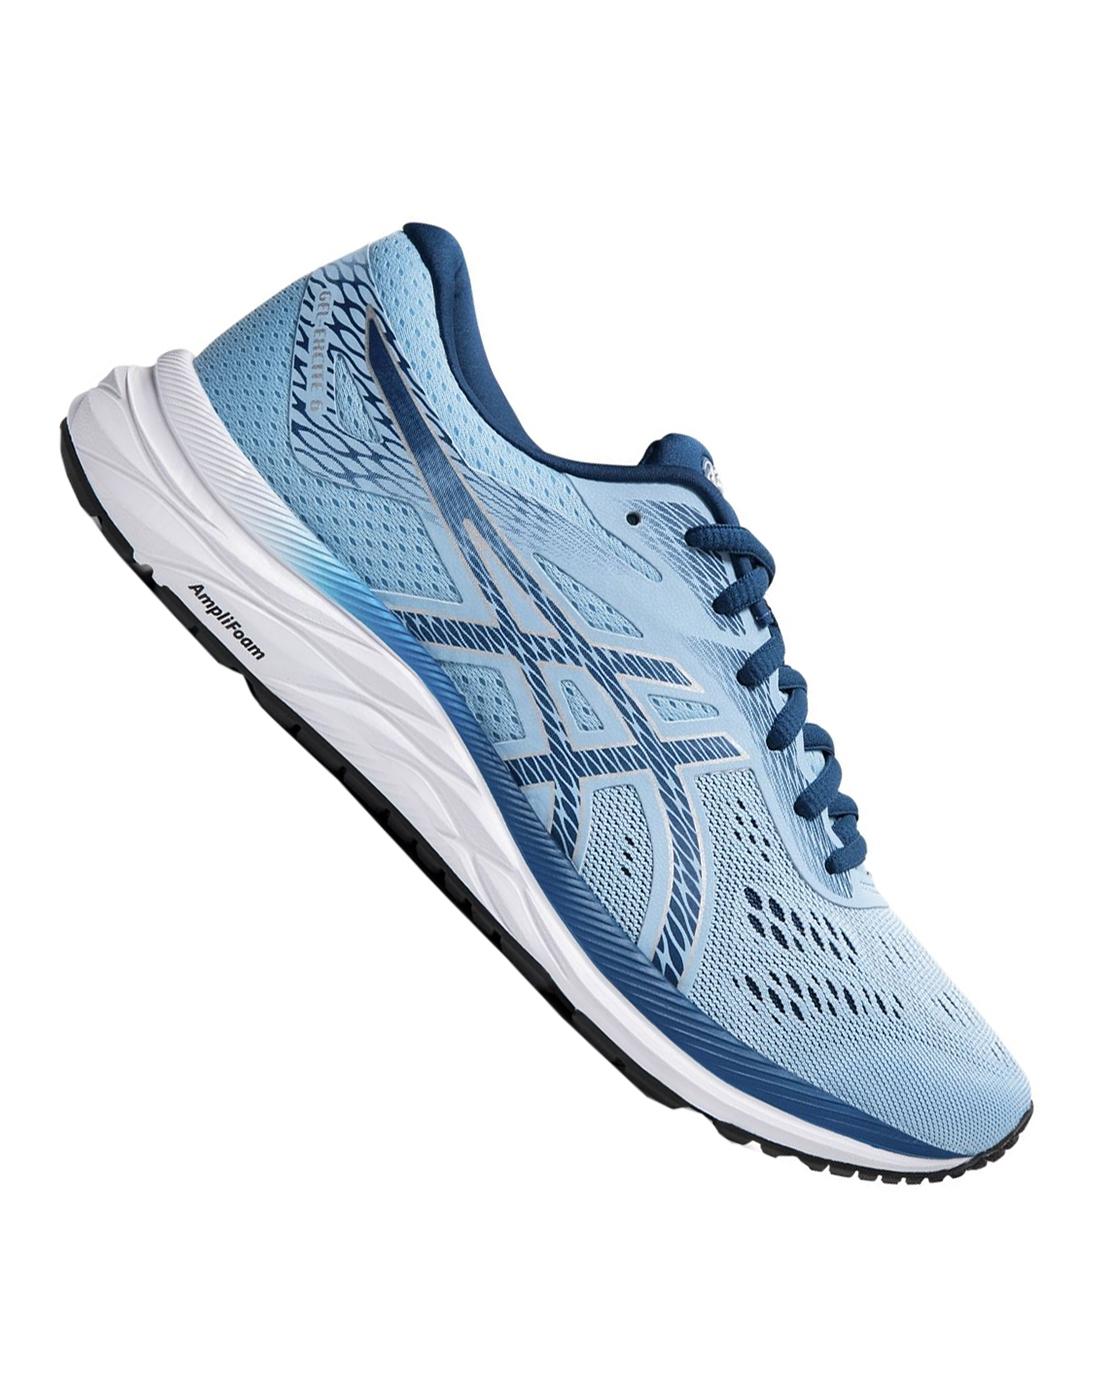 8b681a1d5105e9 Women's Blue ASICS Gel Excite 6 | Life Style Sports